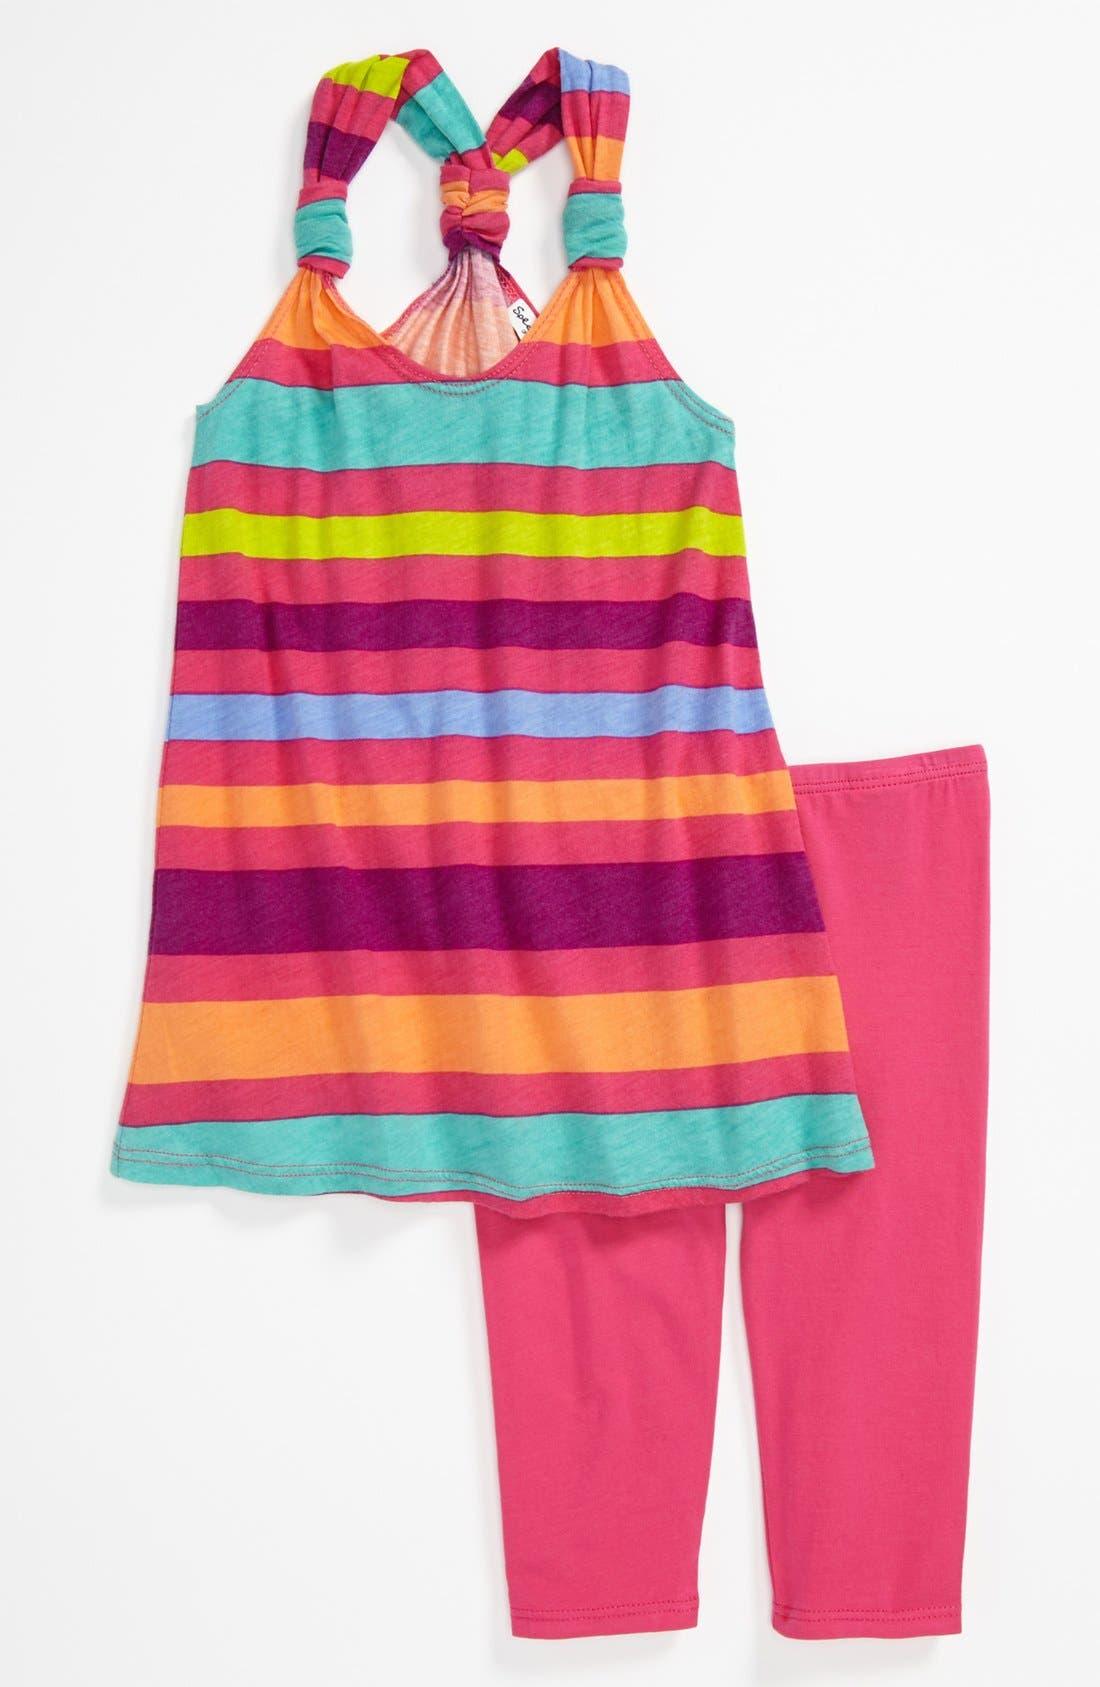 Main Image - Splendid 'Carnival Stripe' Tank Top & Leggings (Toddler)